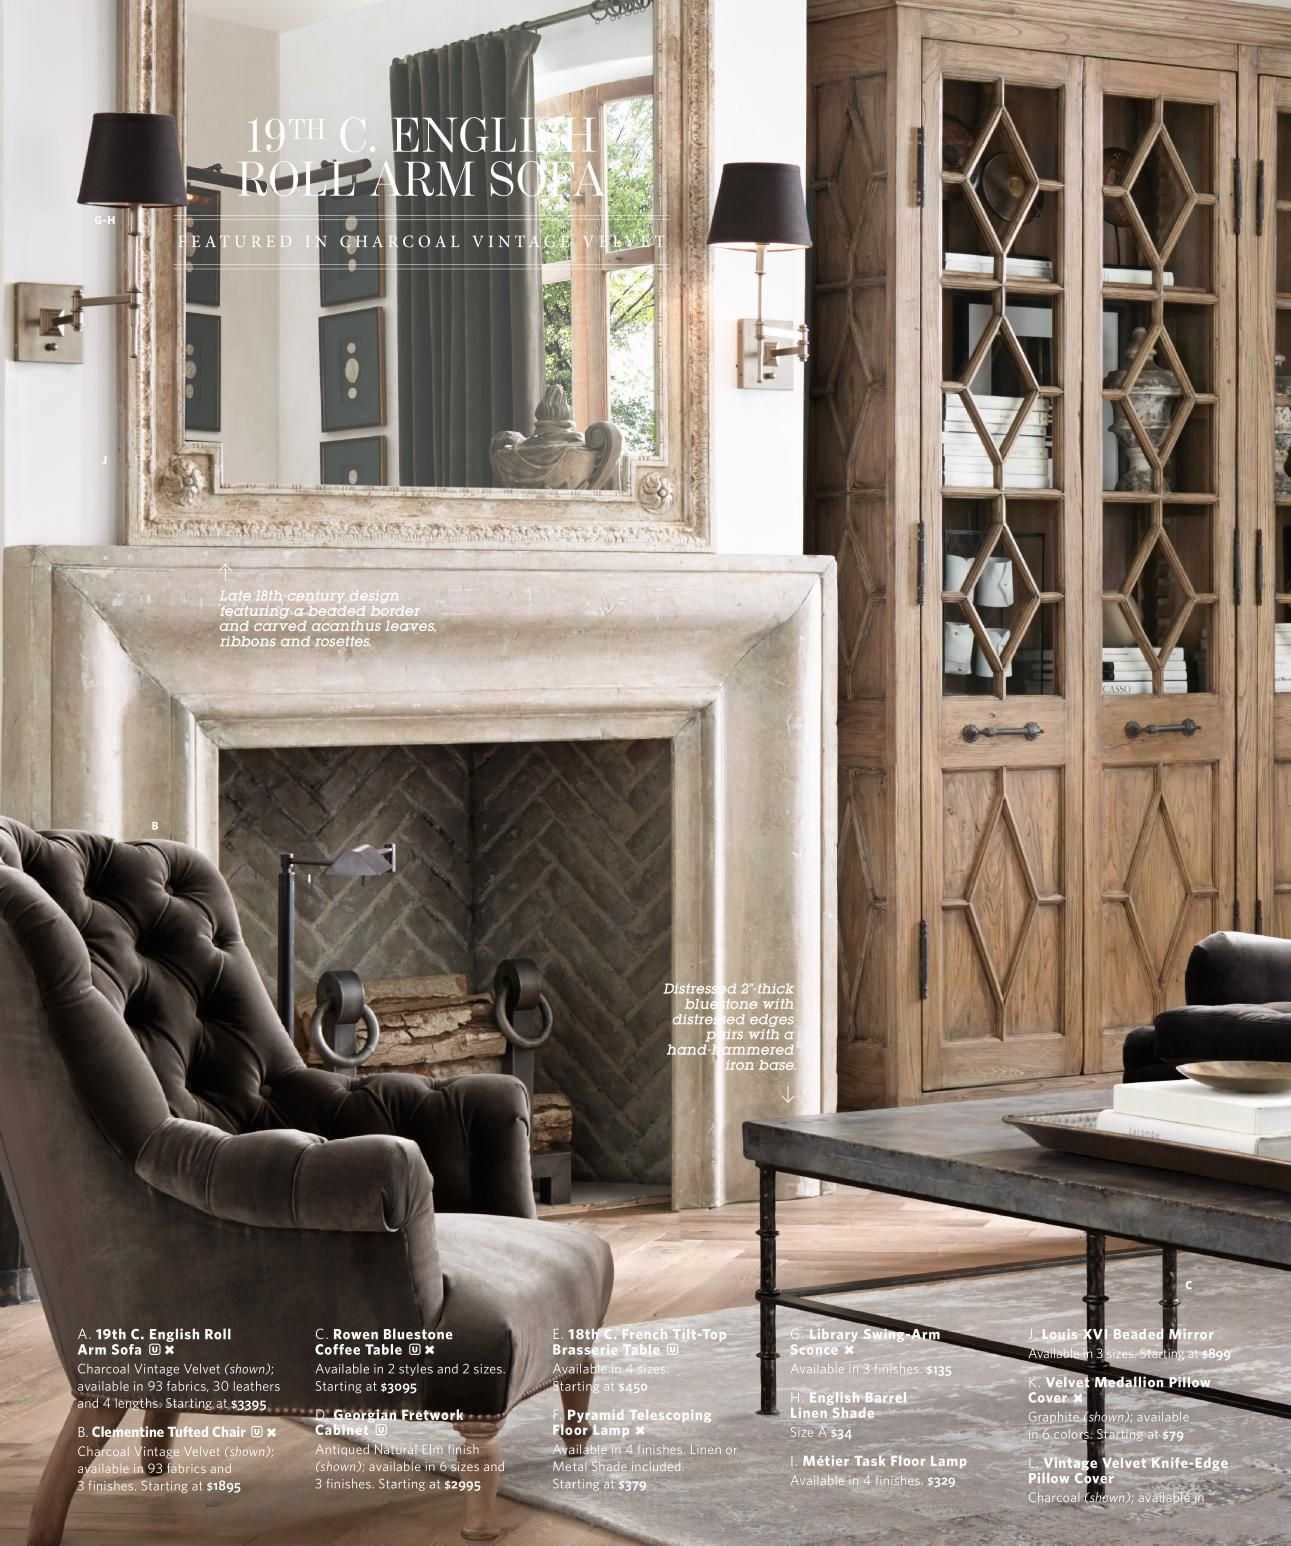 Restoration Hardware Fireplace But In Dark Grey Fireplace Surrounds Home Fireplace Restoration Hardware Bedroom